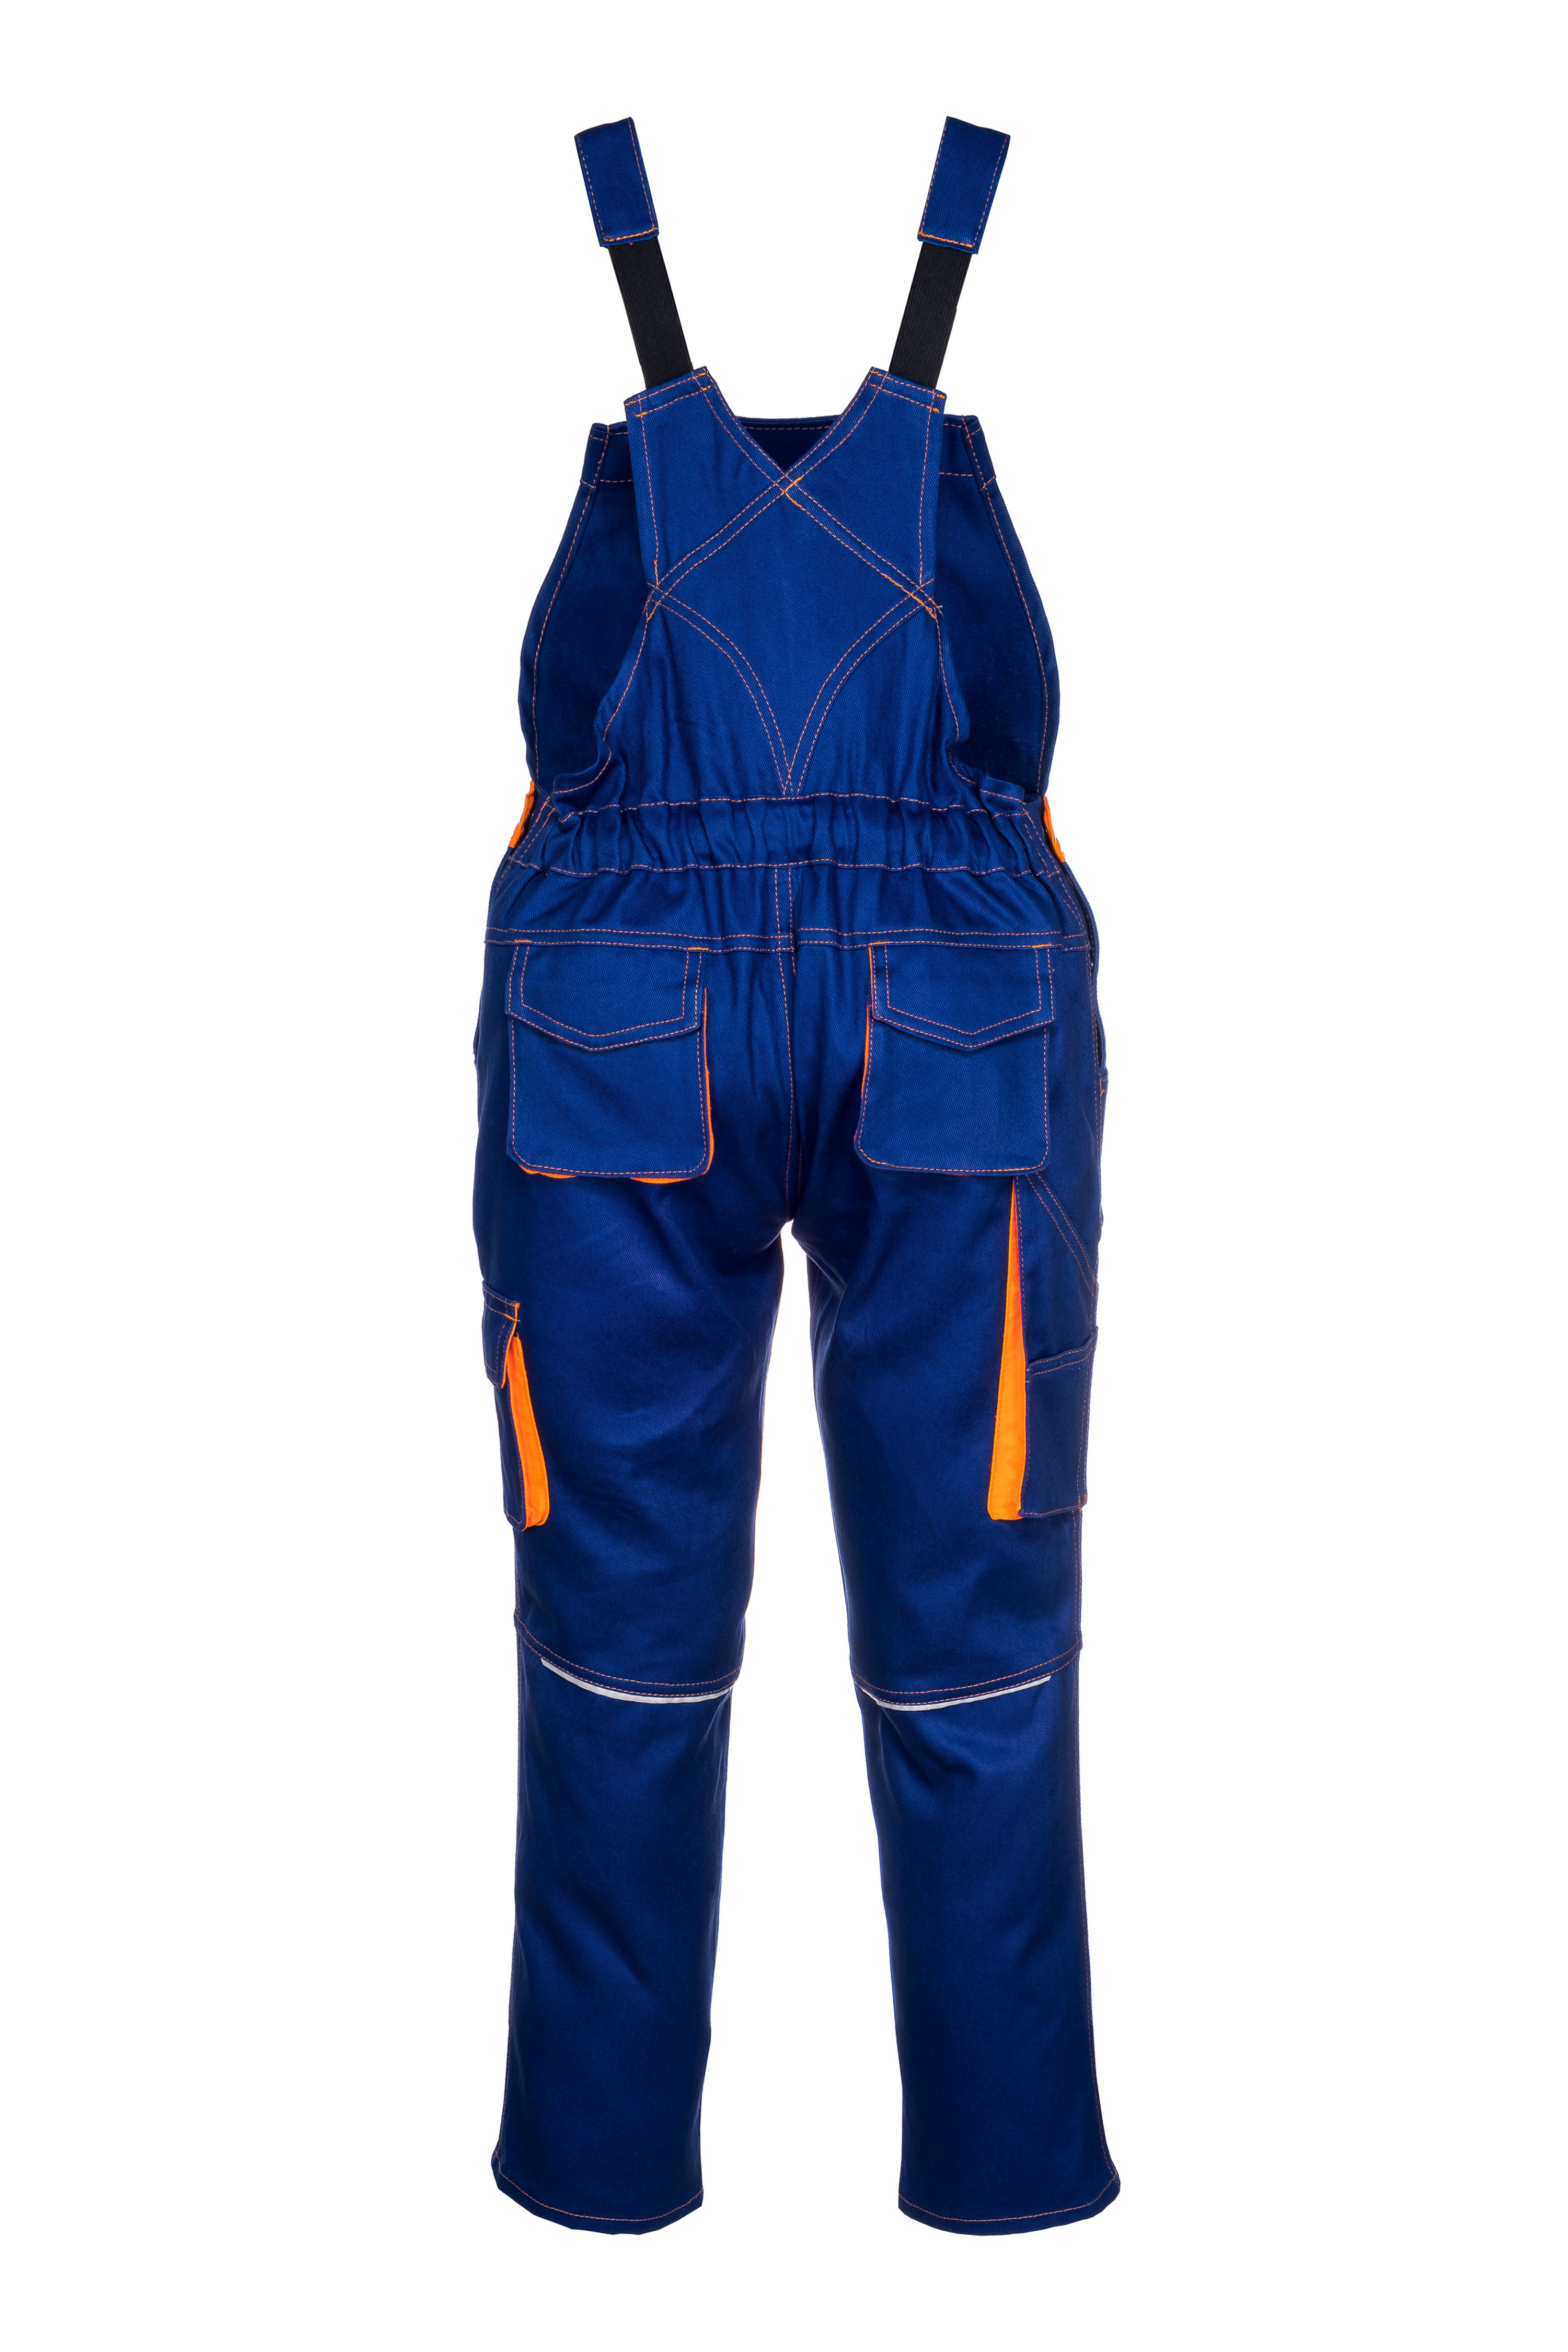 46 BP Basic Latzhose 106 dunkelblau mit Metallschnallen Gr 48 102